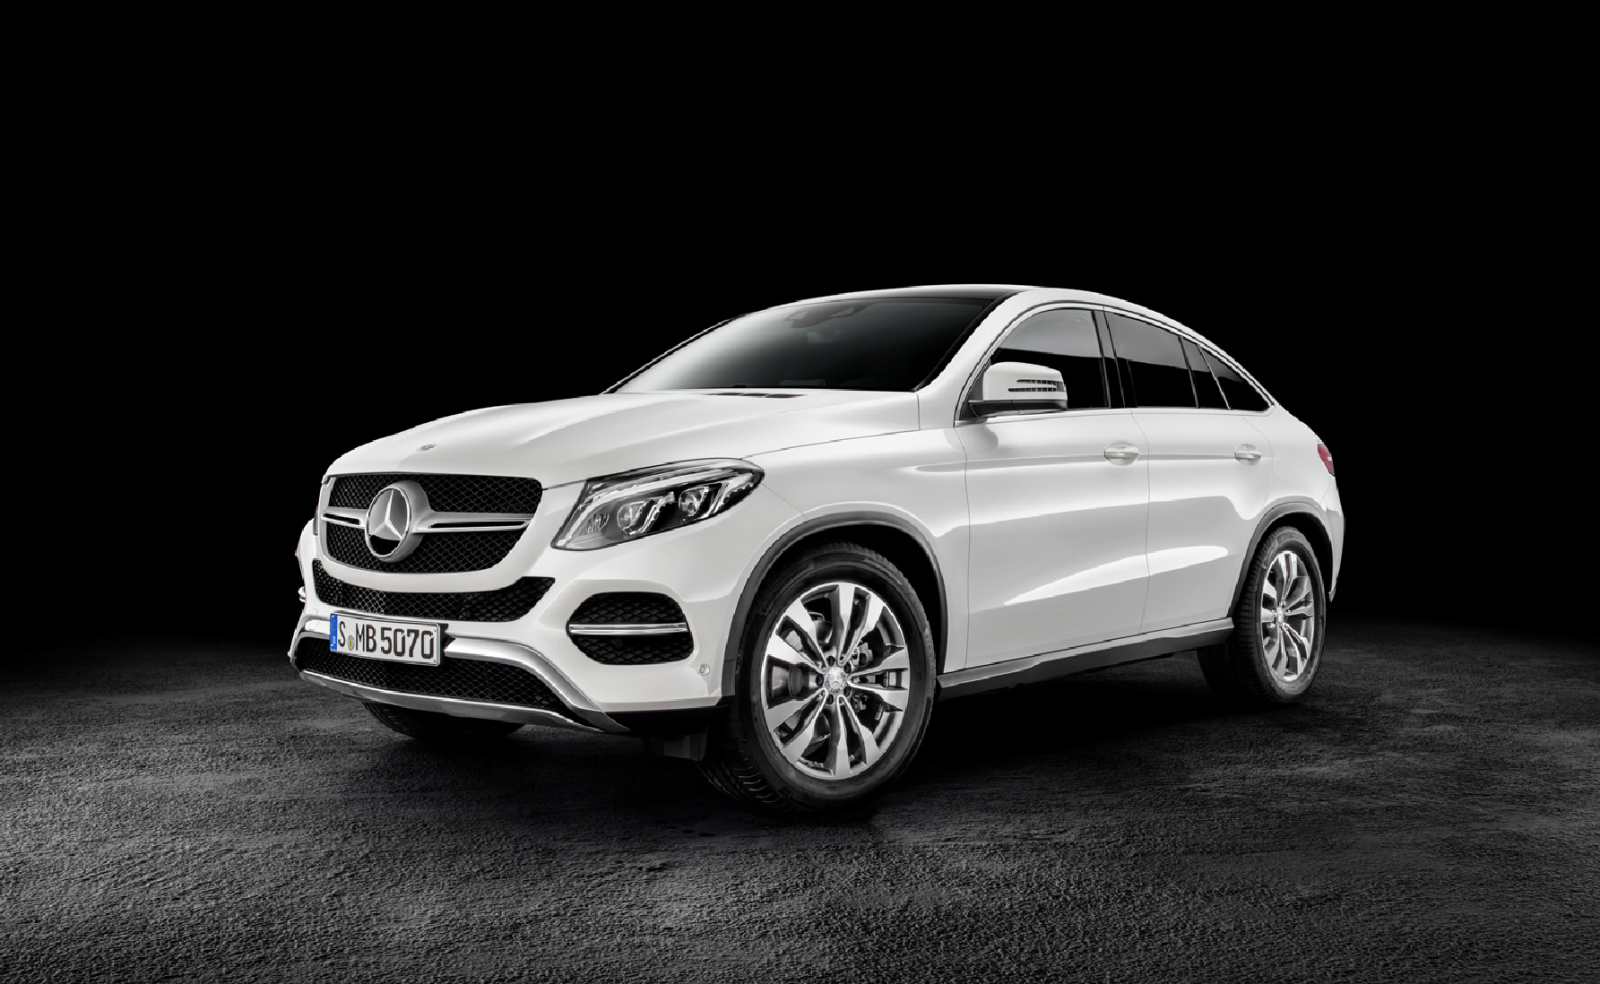 Mercedes-Benz GLE Coupé Starts